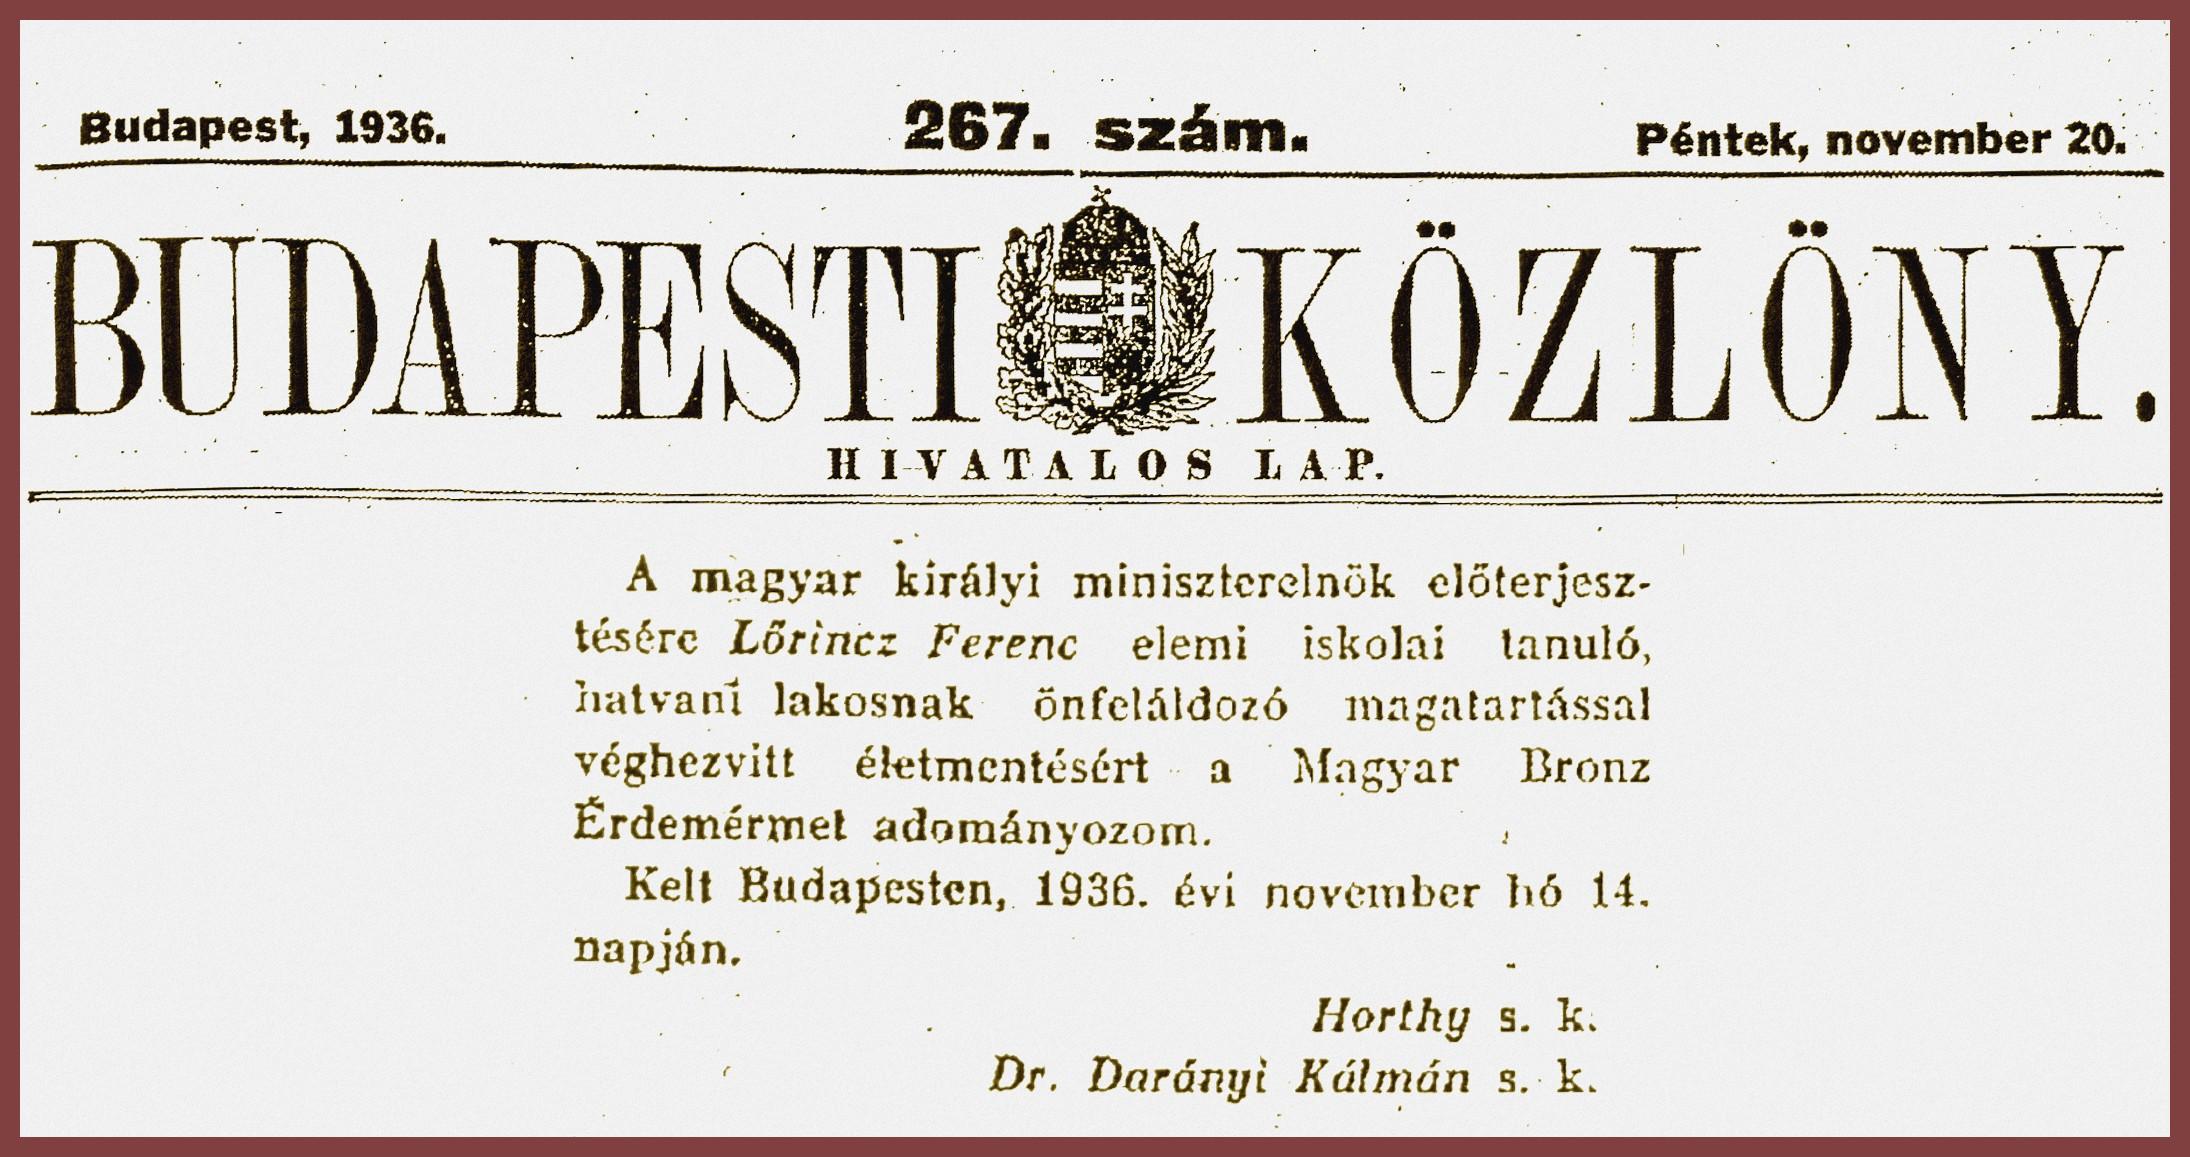 Magyar Közlöny 1936 v3.jpg